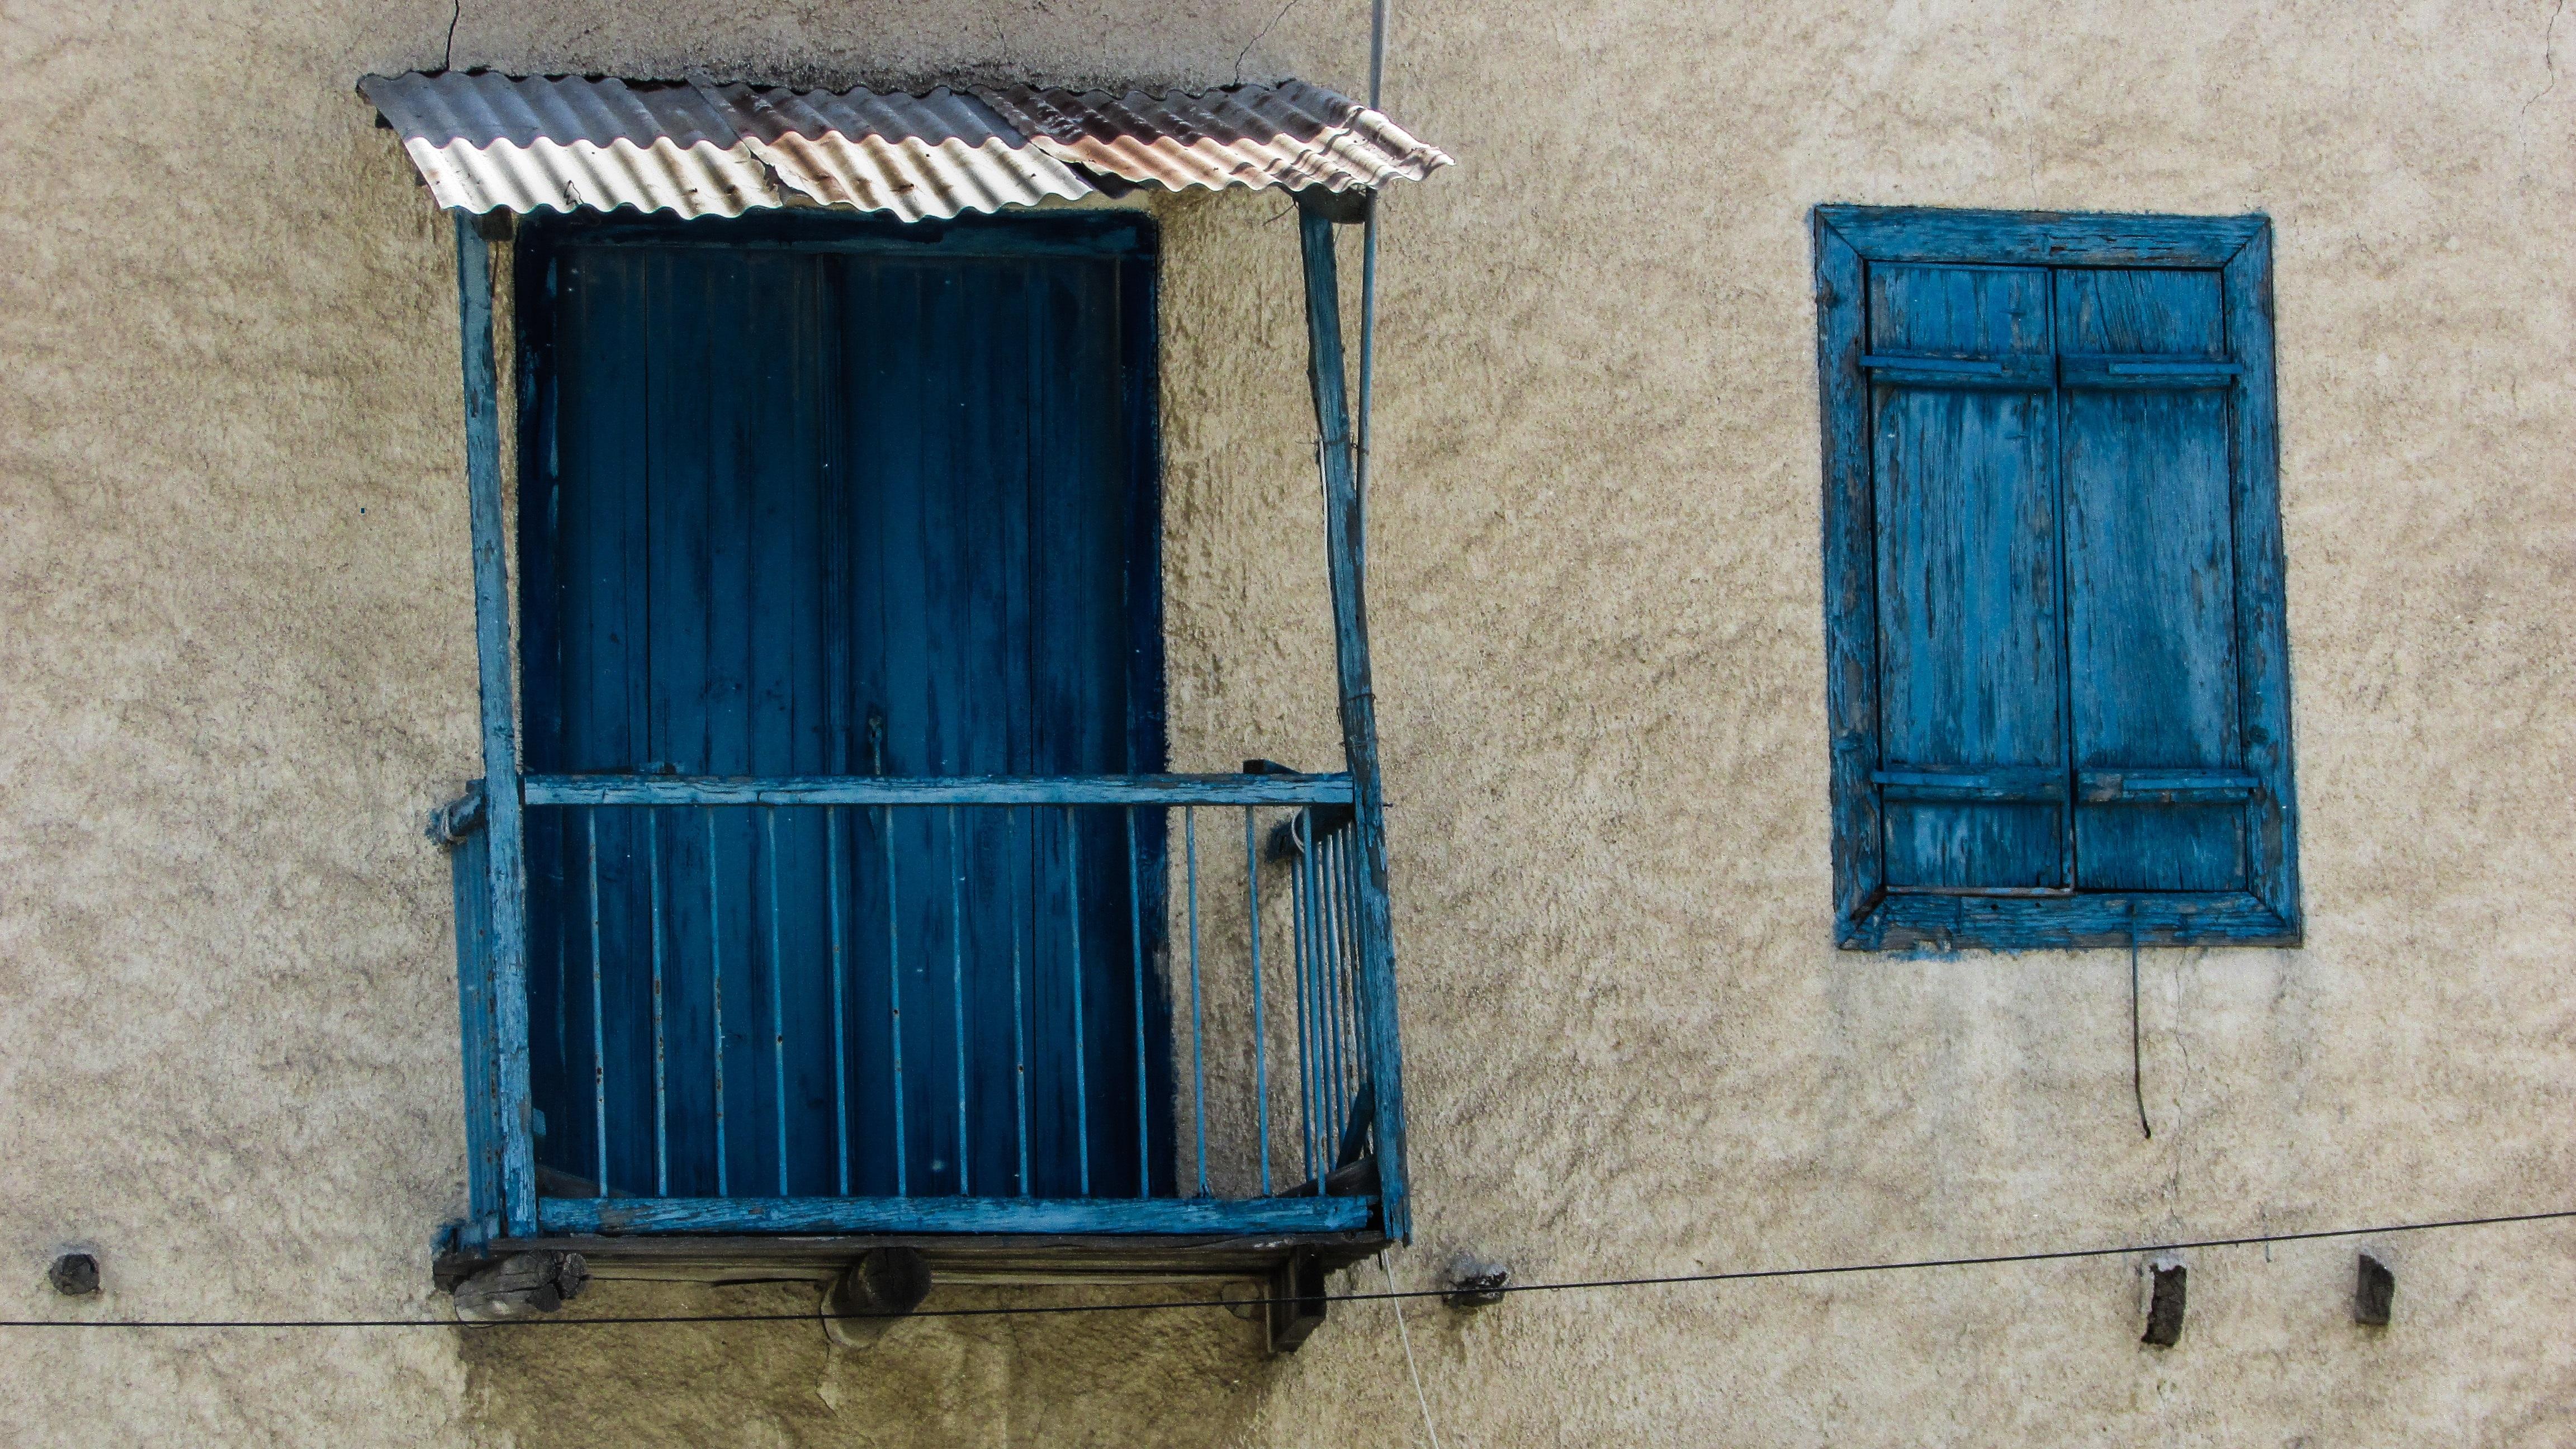 Gratis Afbeeldingen : architectuur, hout, venster, muur, kleur ...